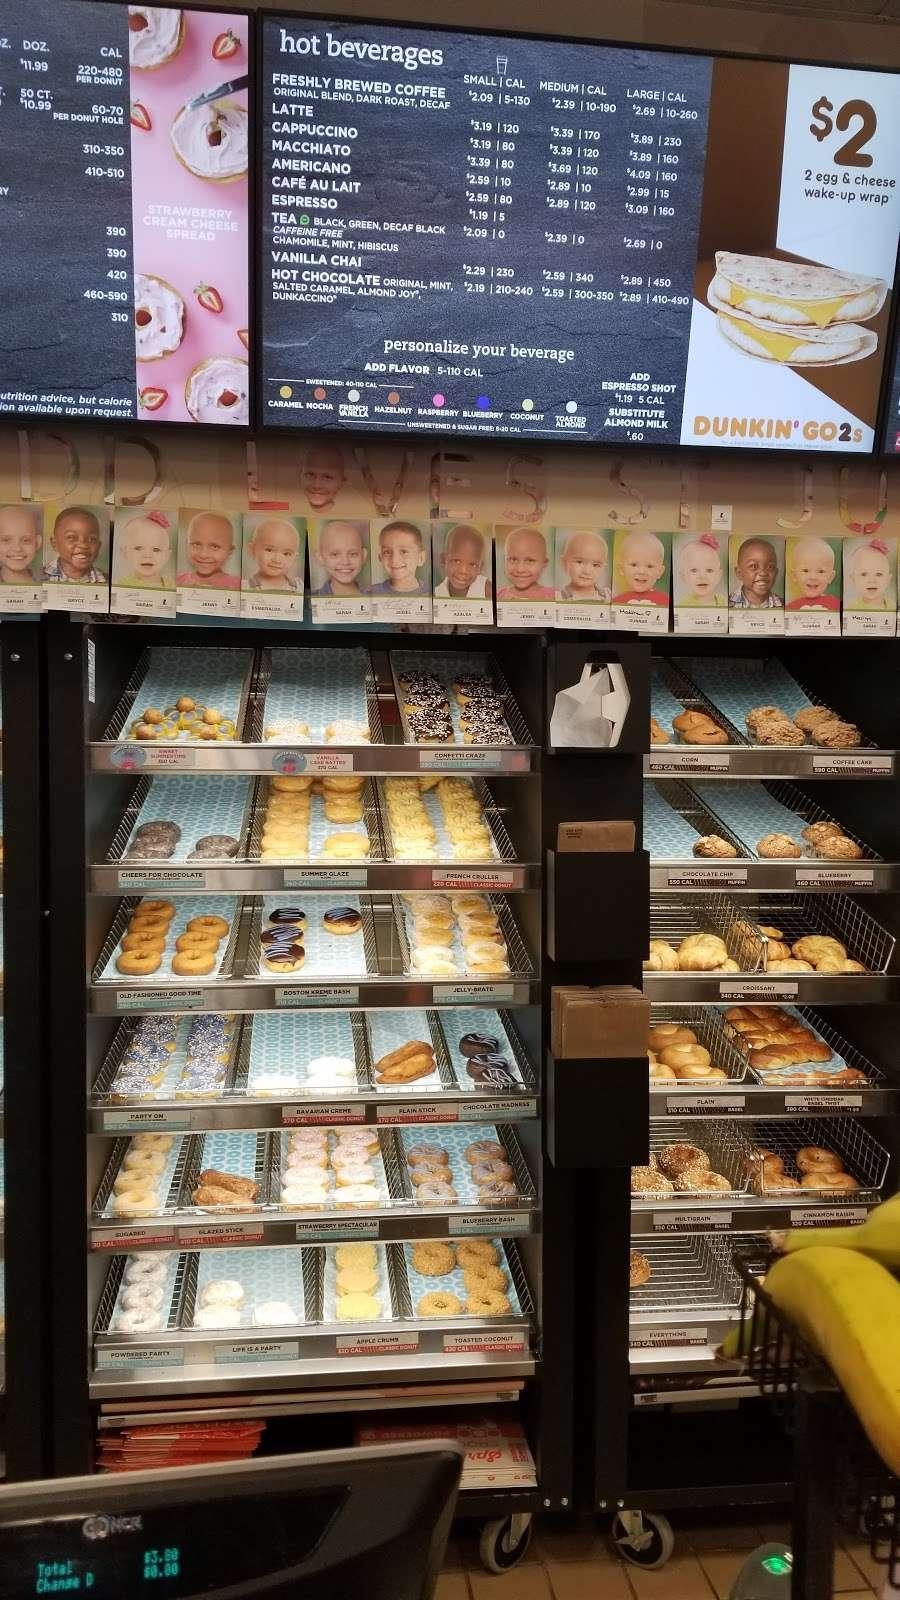 Dunkin Donuts - cafe  | Photo 9 of 10 | Address: 34-21 Greenpoint Ave, Long Island City, NY 11101, USA | Phone: (718) 937-7770